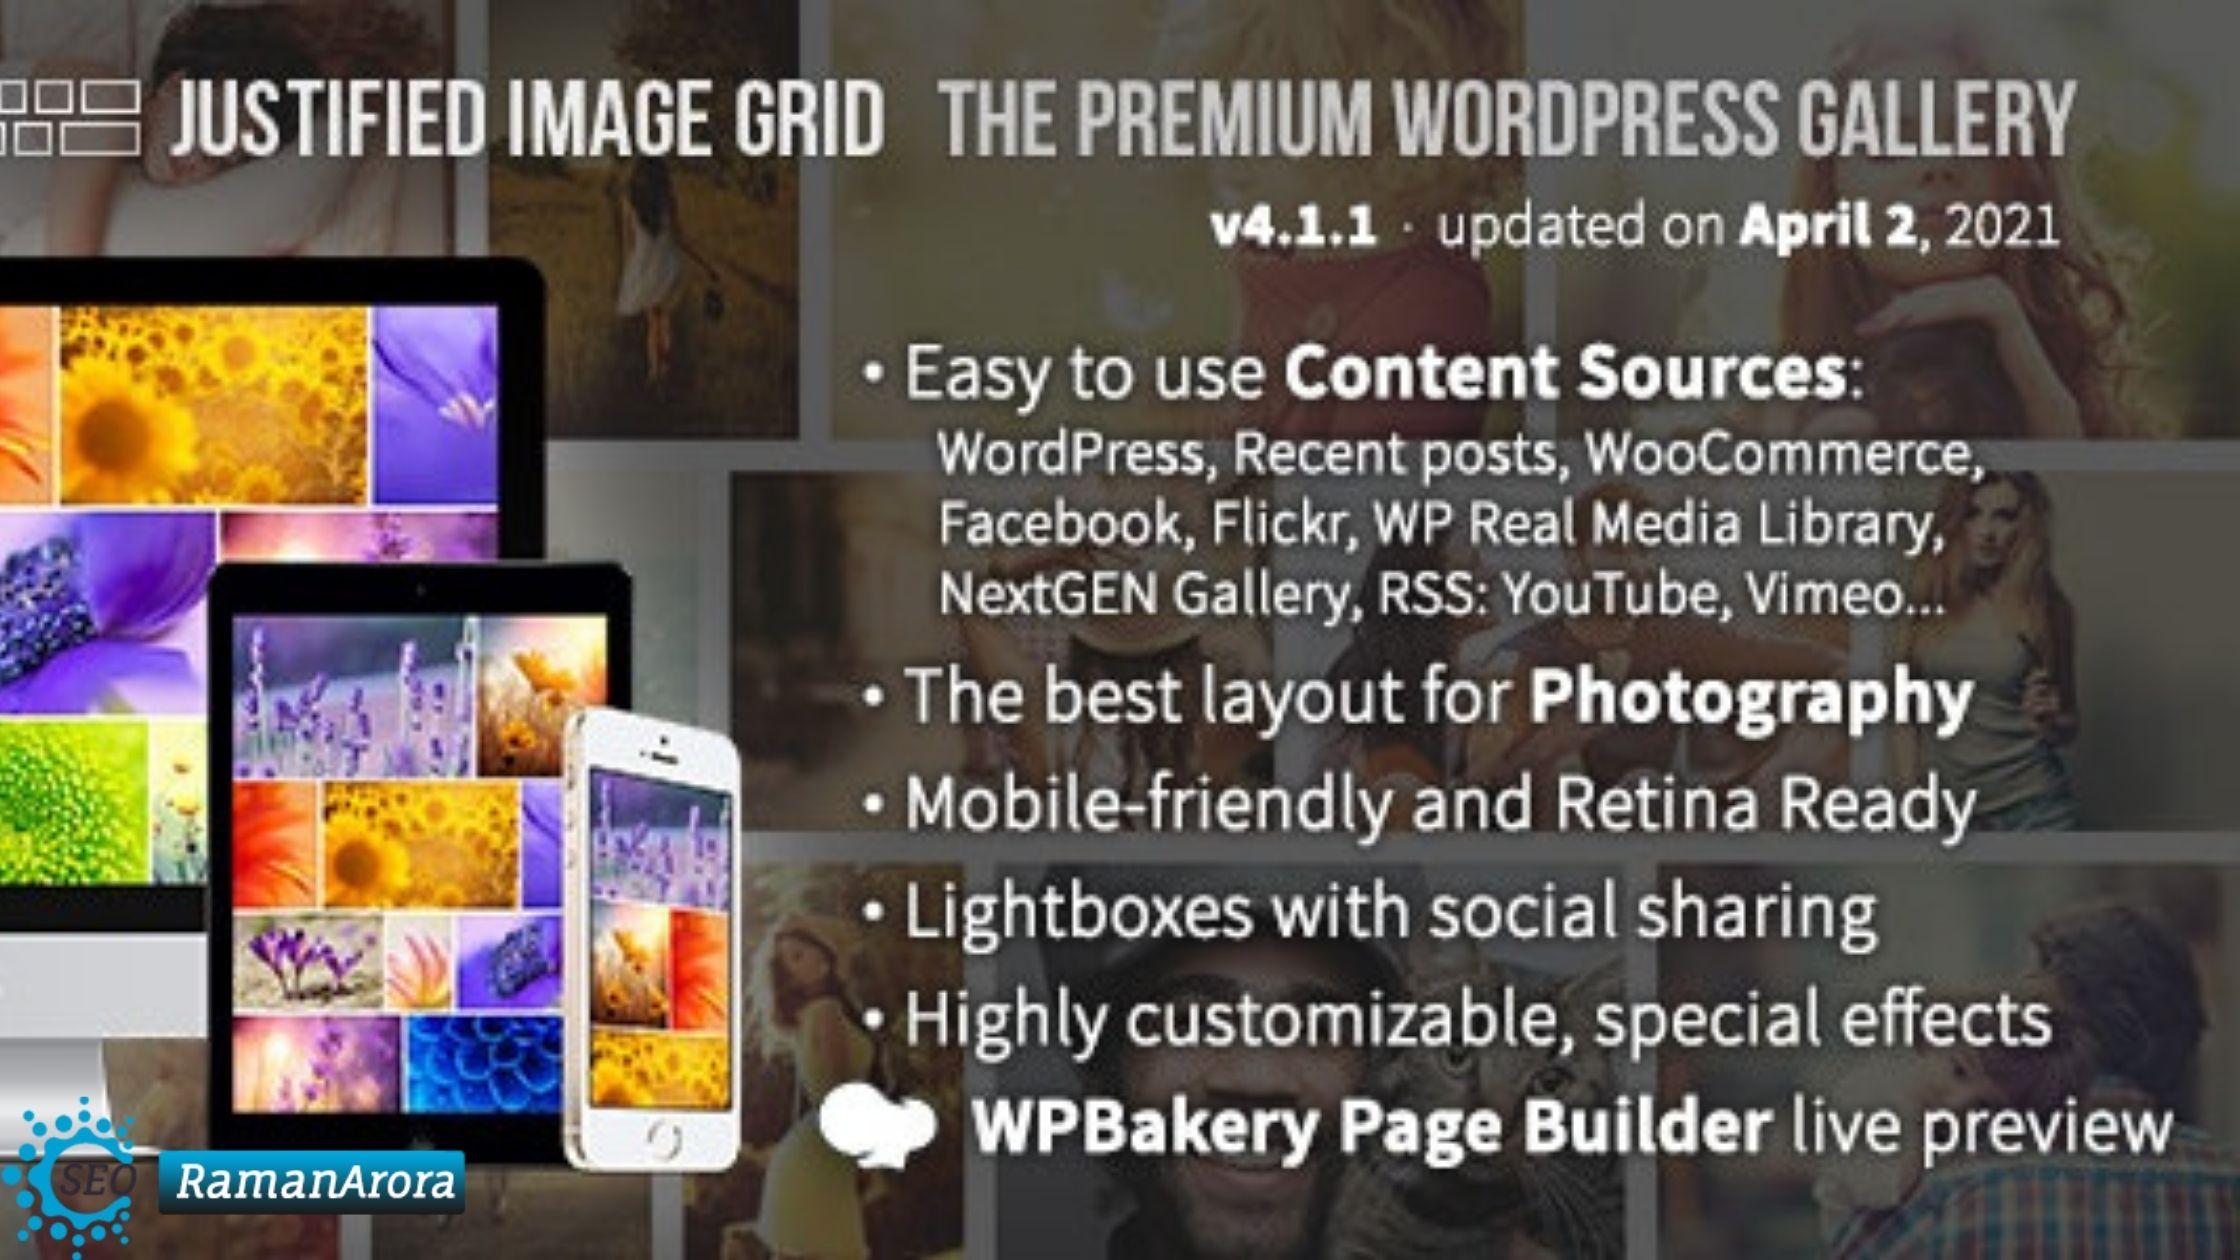 Justified Image Grid Review - Premium WordPress Gallery Plugin for Portfolio